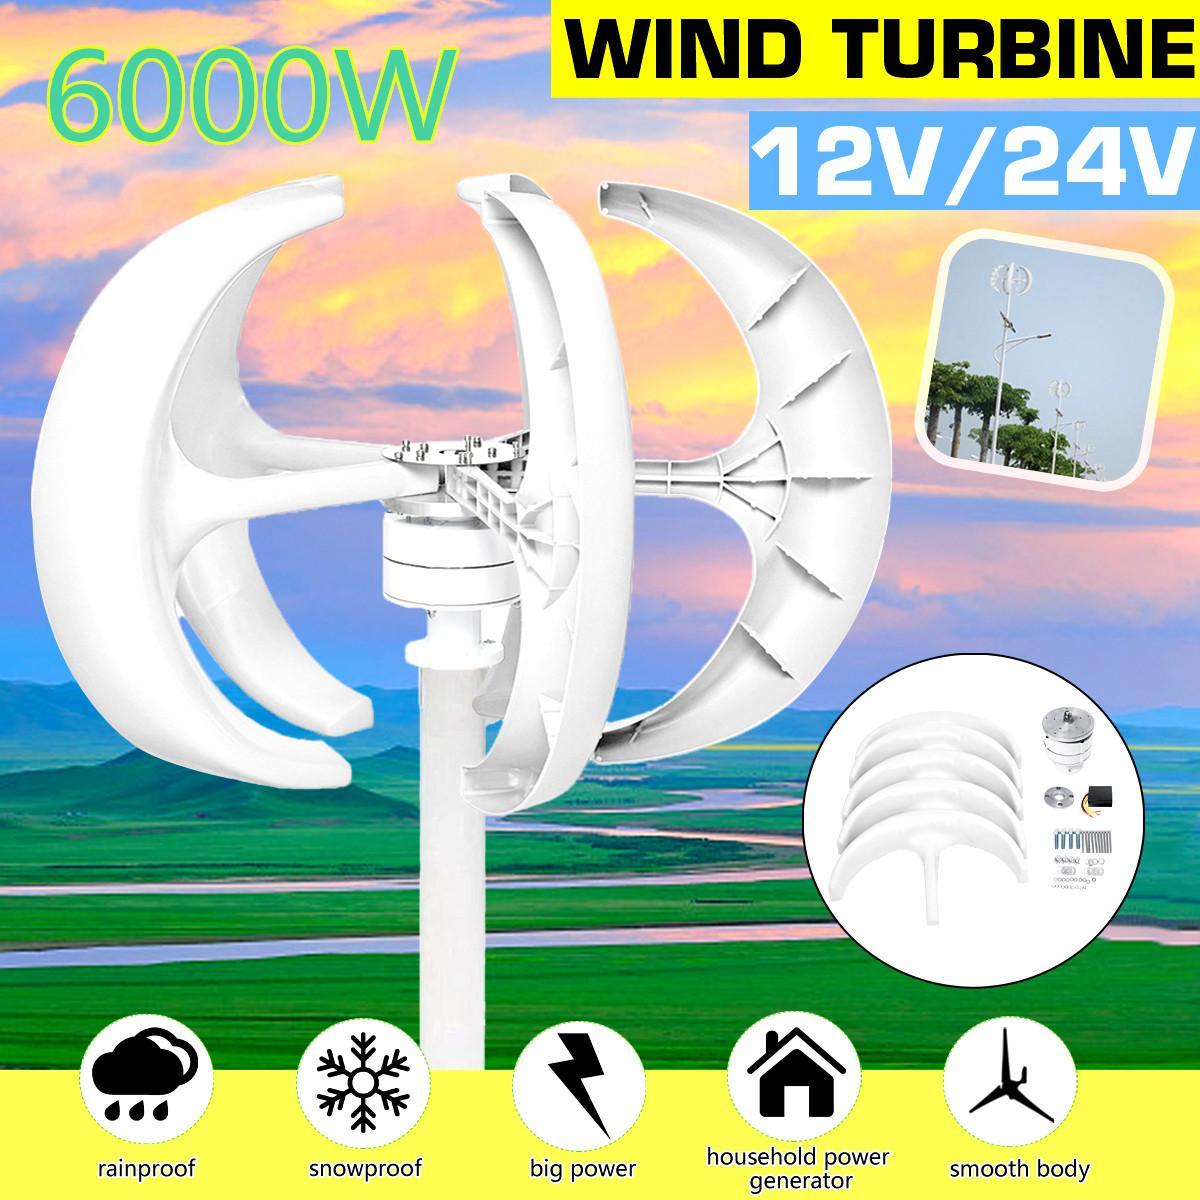 6000W 12V 24V Vertical Axis Wind Turbines Generator Lantern 5 Blades Motor Kit For Home Hybrids Streetlight Use Electromagnetic